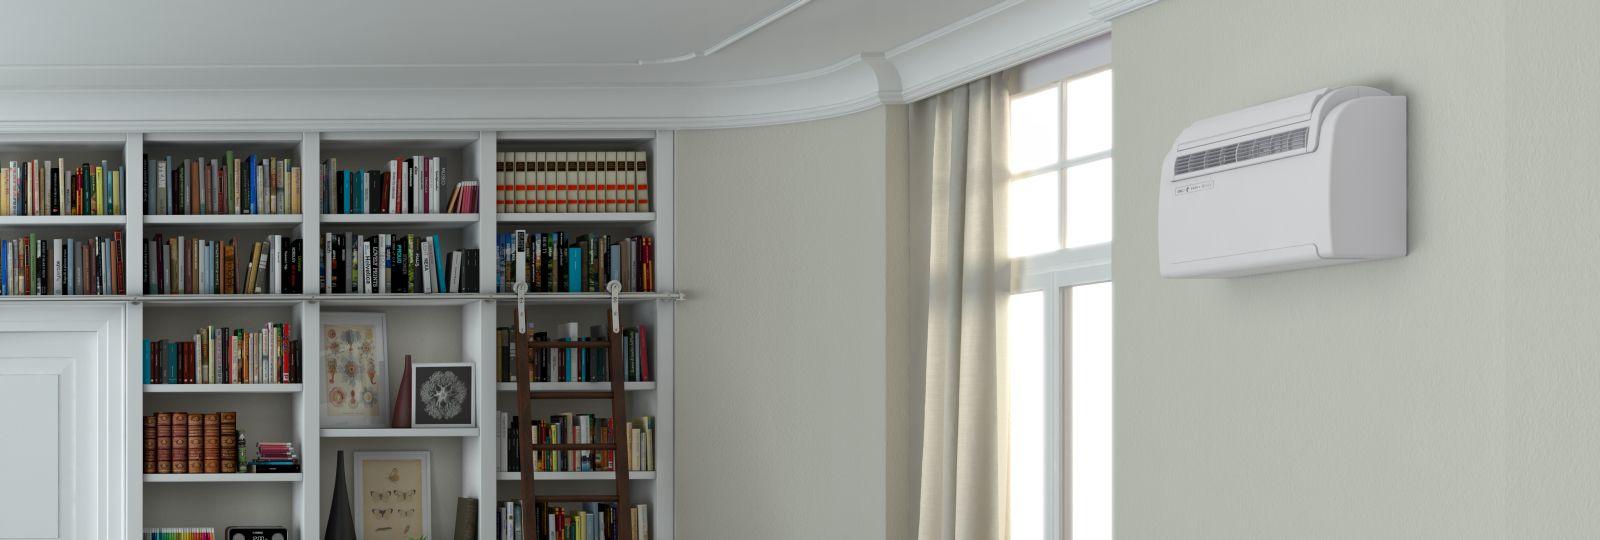 unico on off 11 5 hp. Black Bedroom Furniture Sets. Home Design Ideas